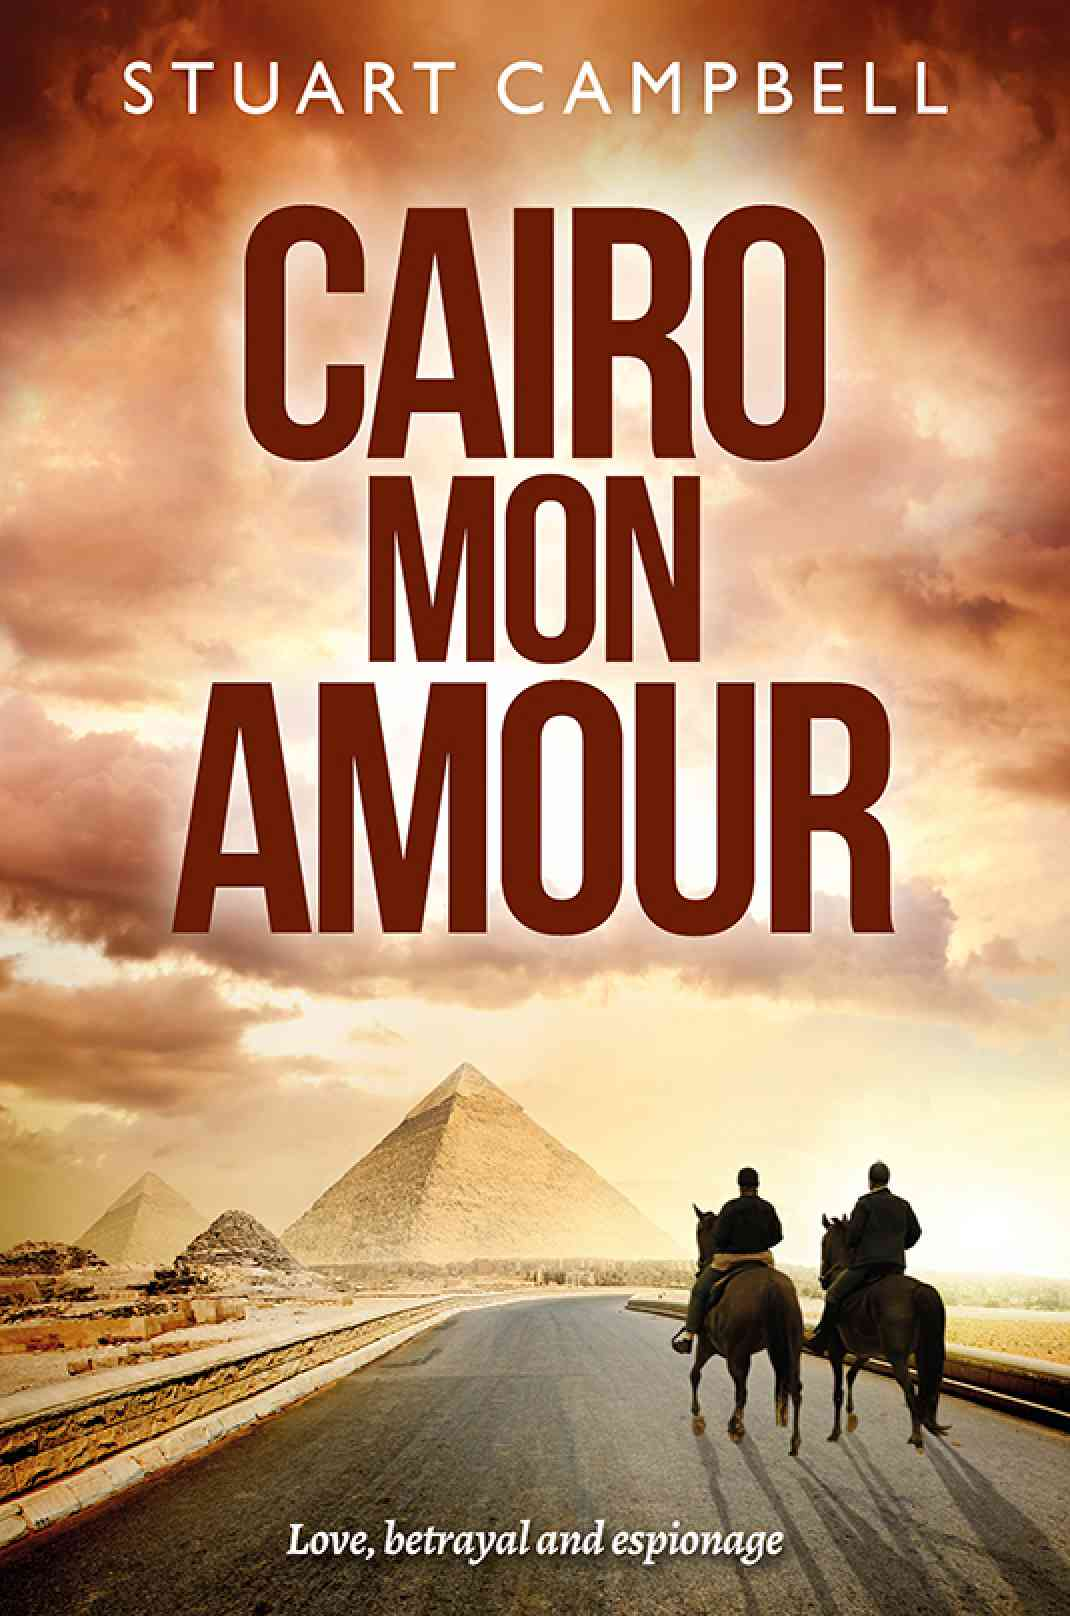 Cairo Mon Amour